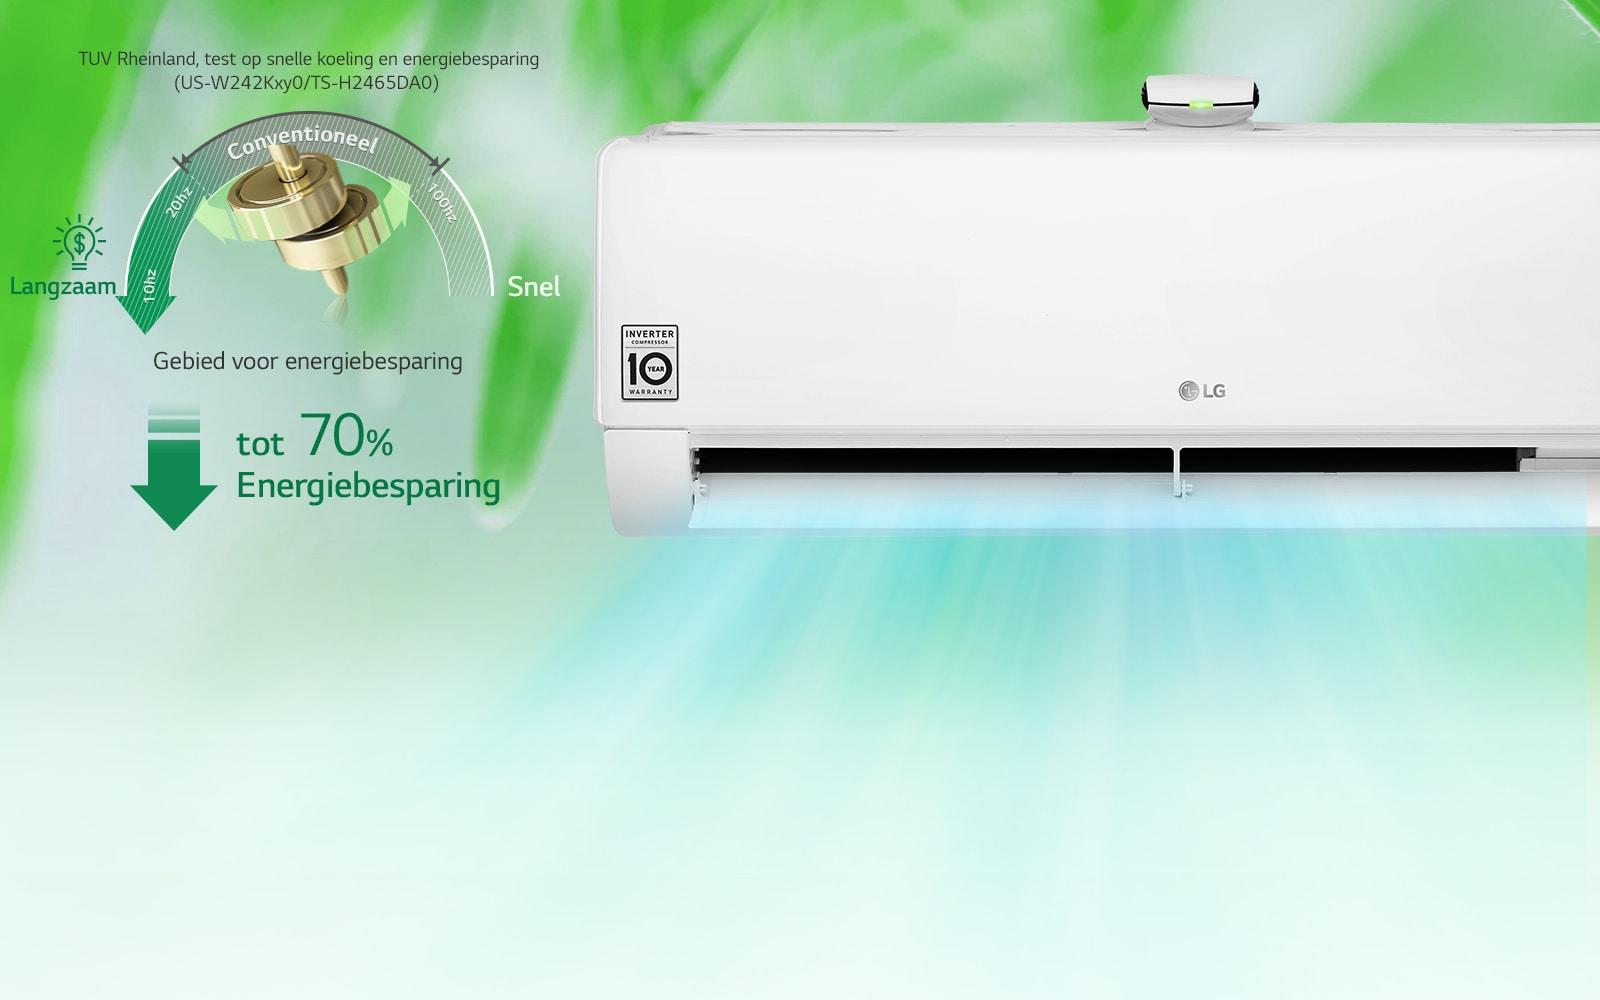 Energiebesparing3